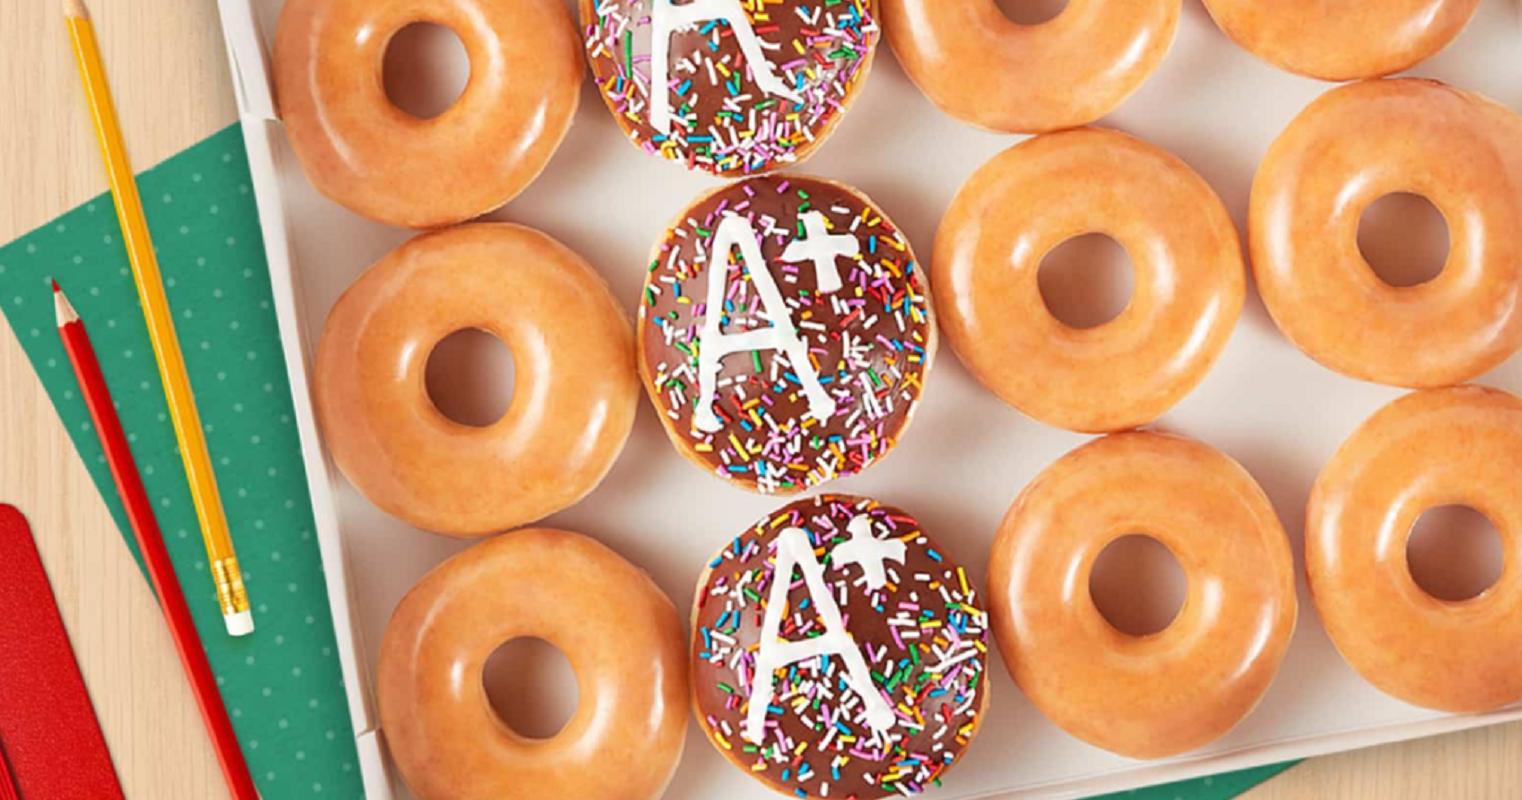 Krispy Kreme A+ Dozen Doughnuts BOGO Free Today Only!